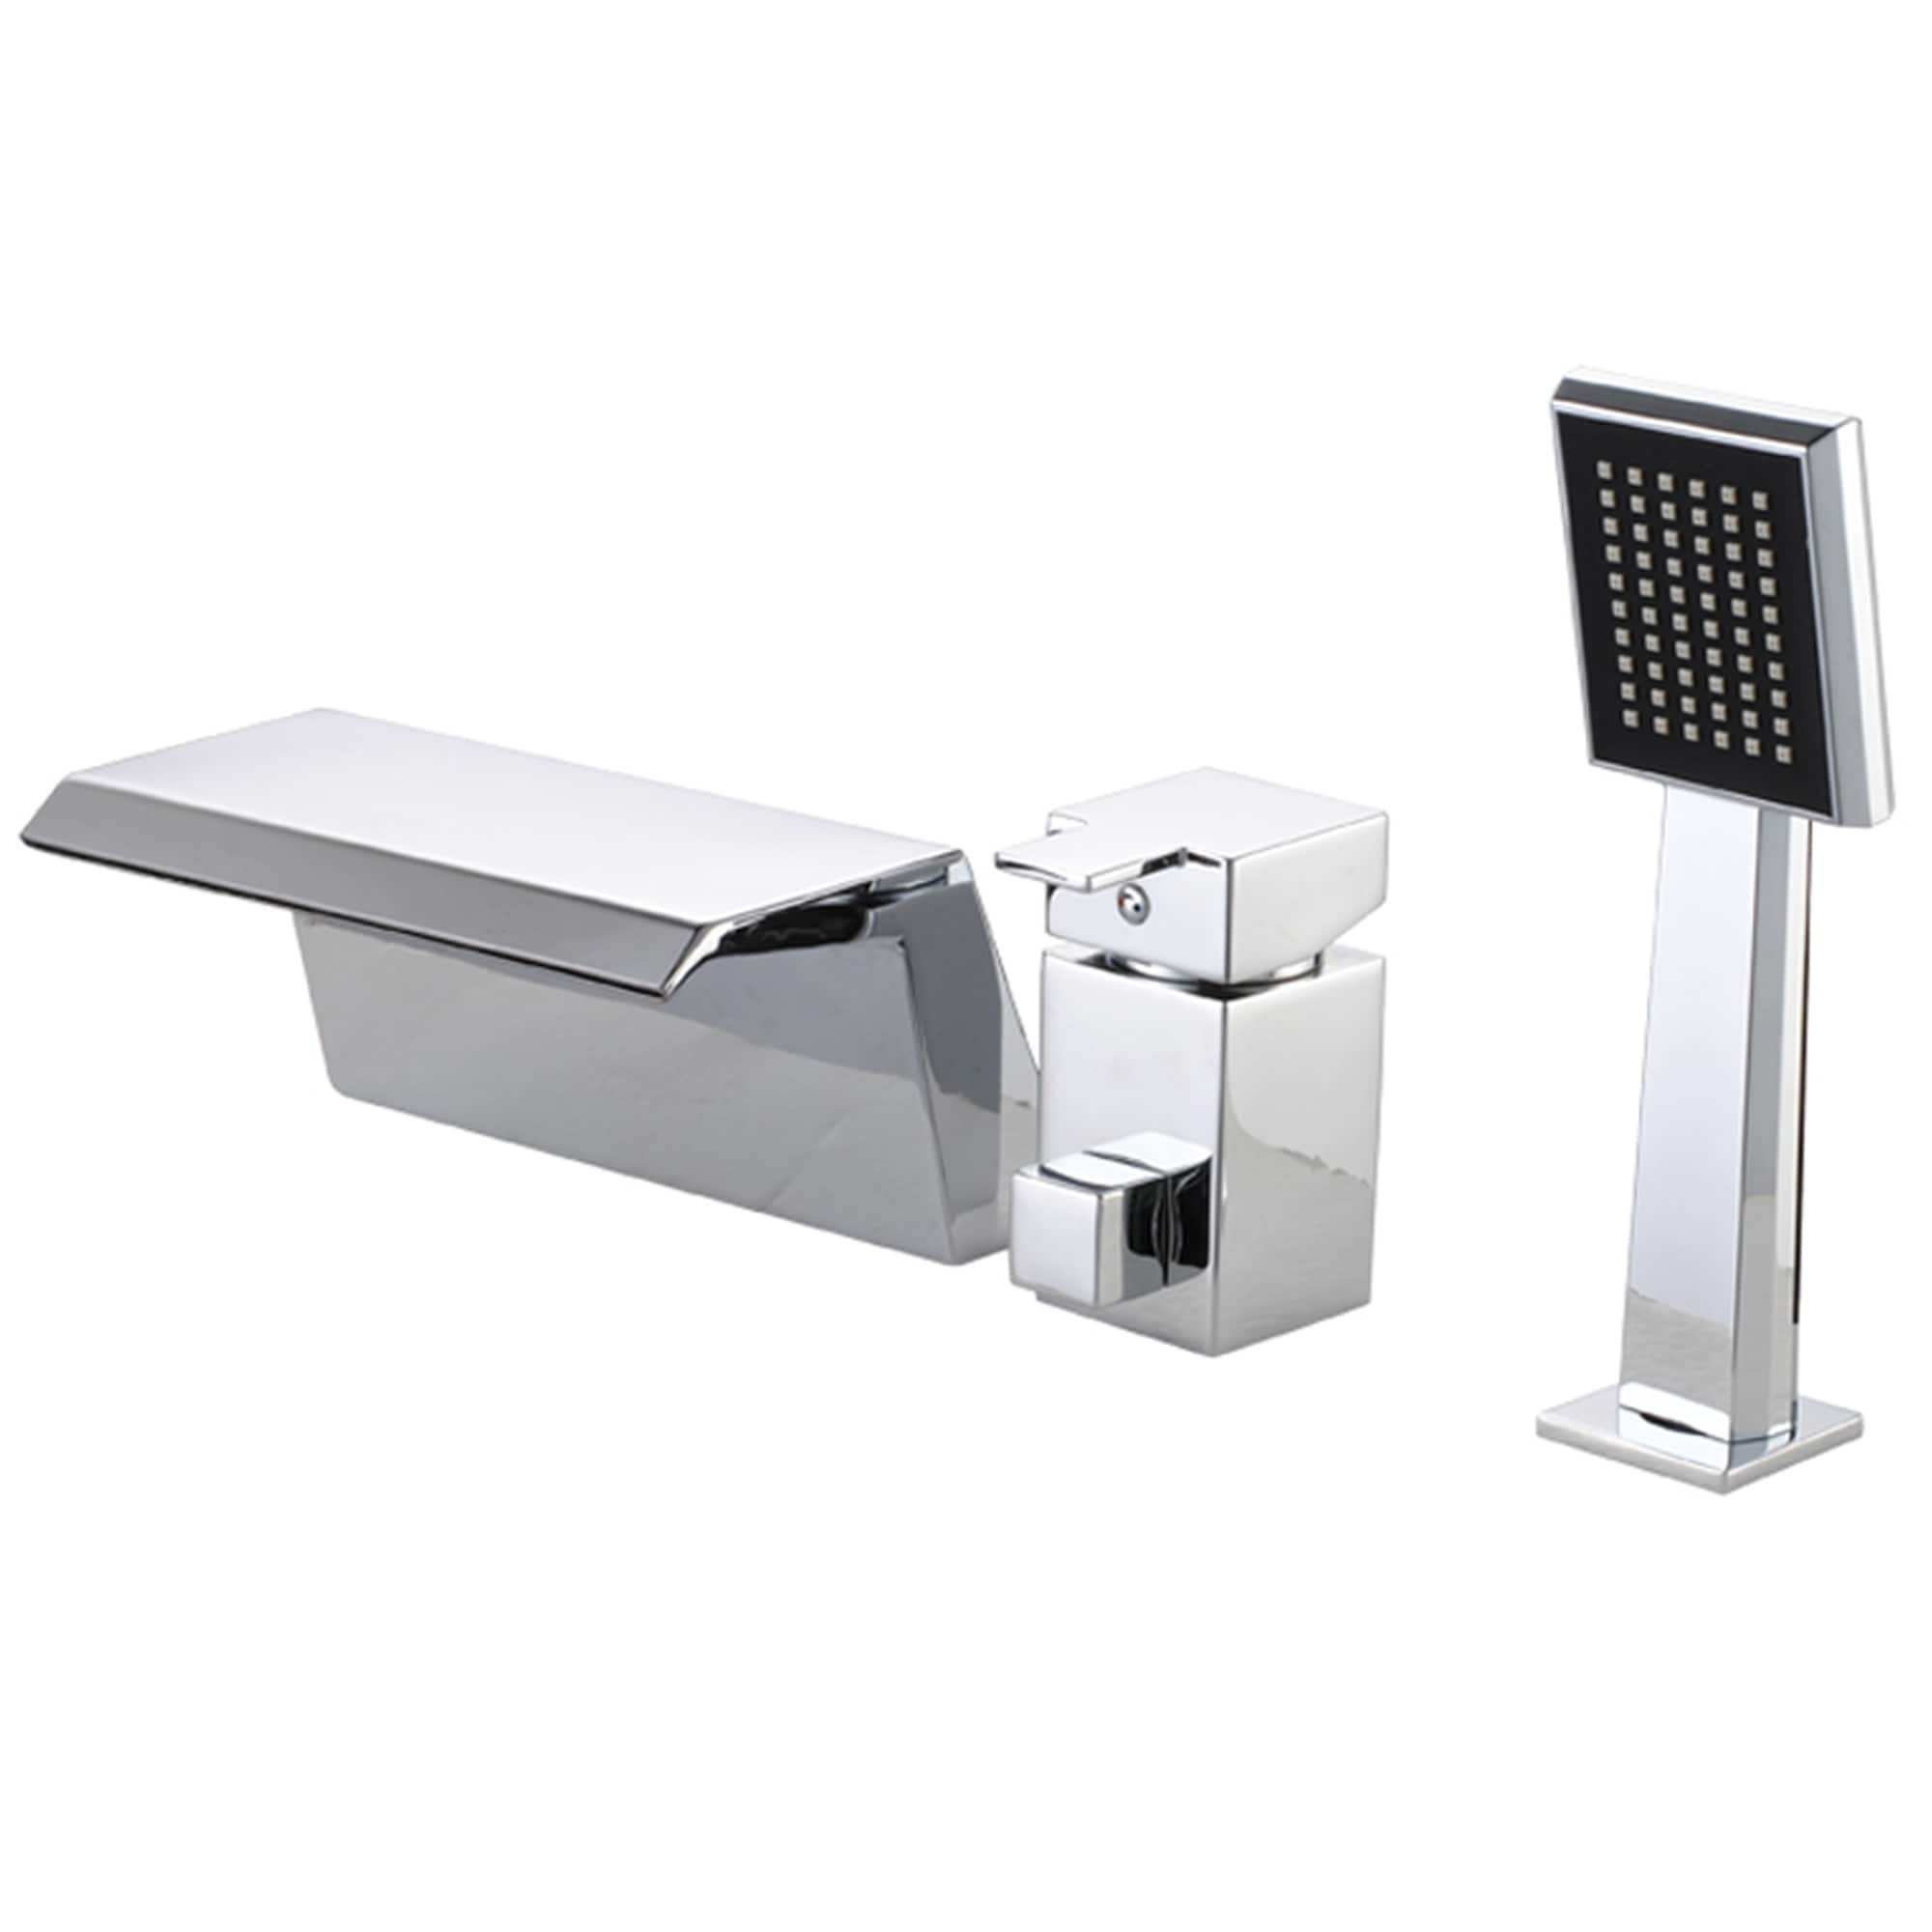 Sumerian Polished Chrome Single Handle Deck Mount Bath Tub Faucet Overstock 9147399